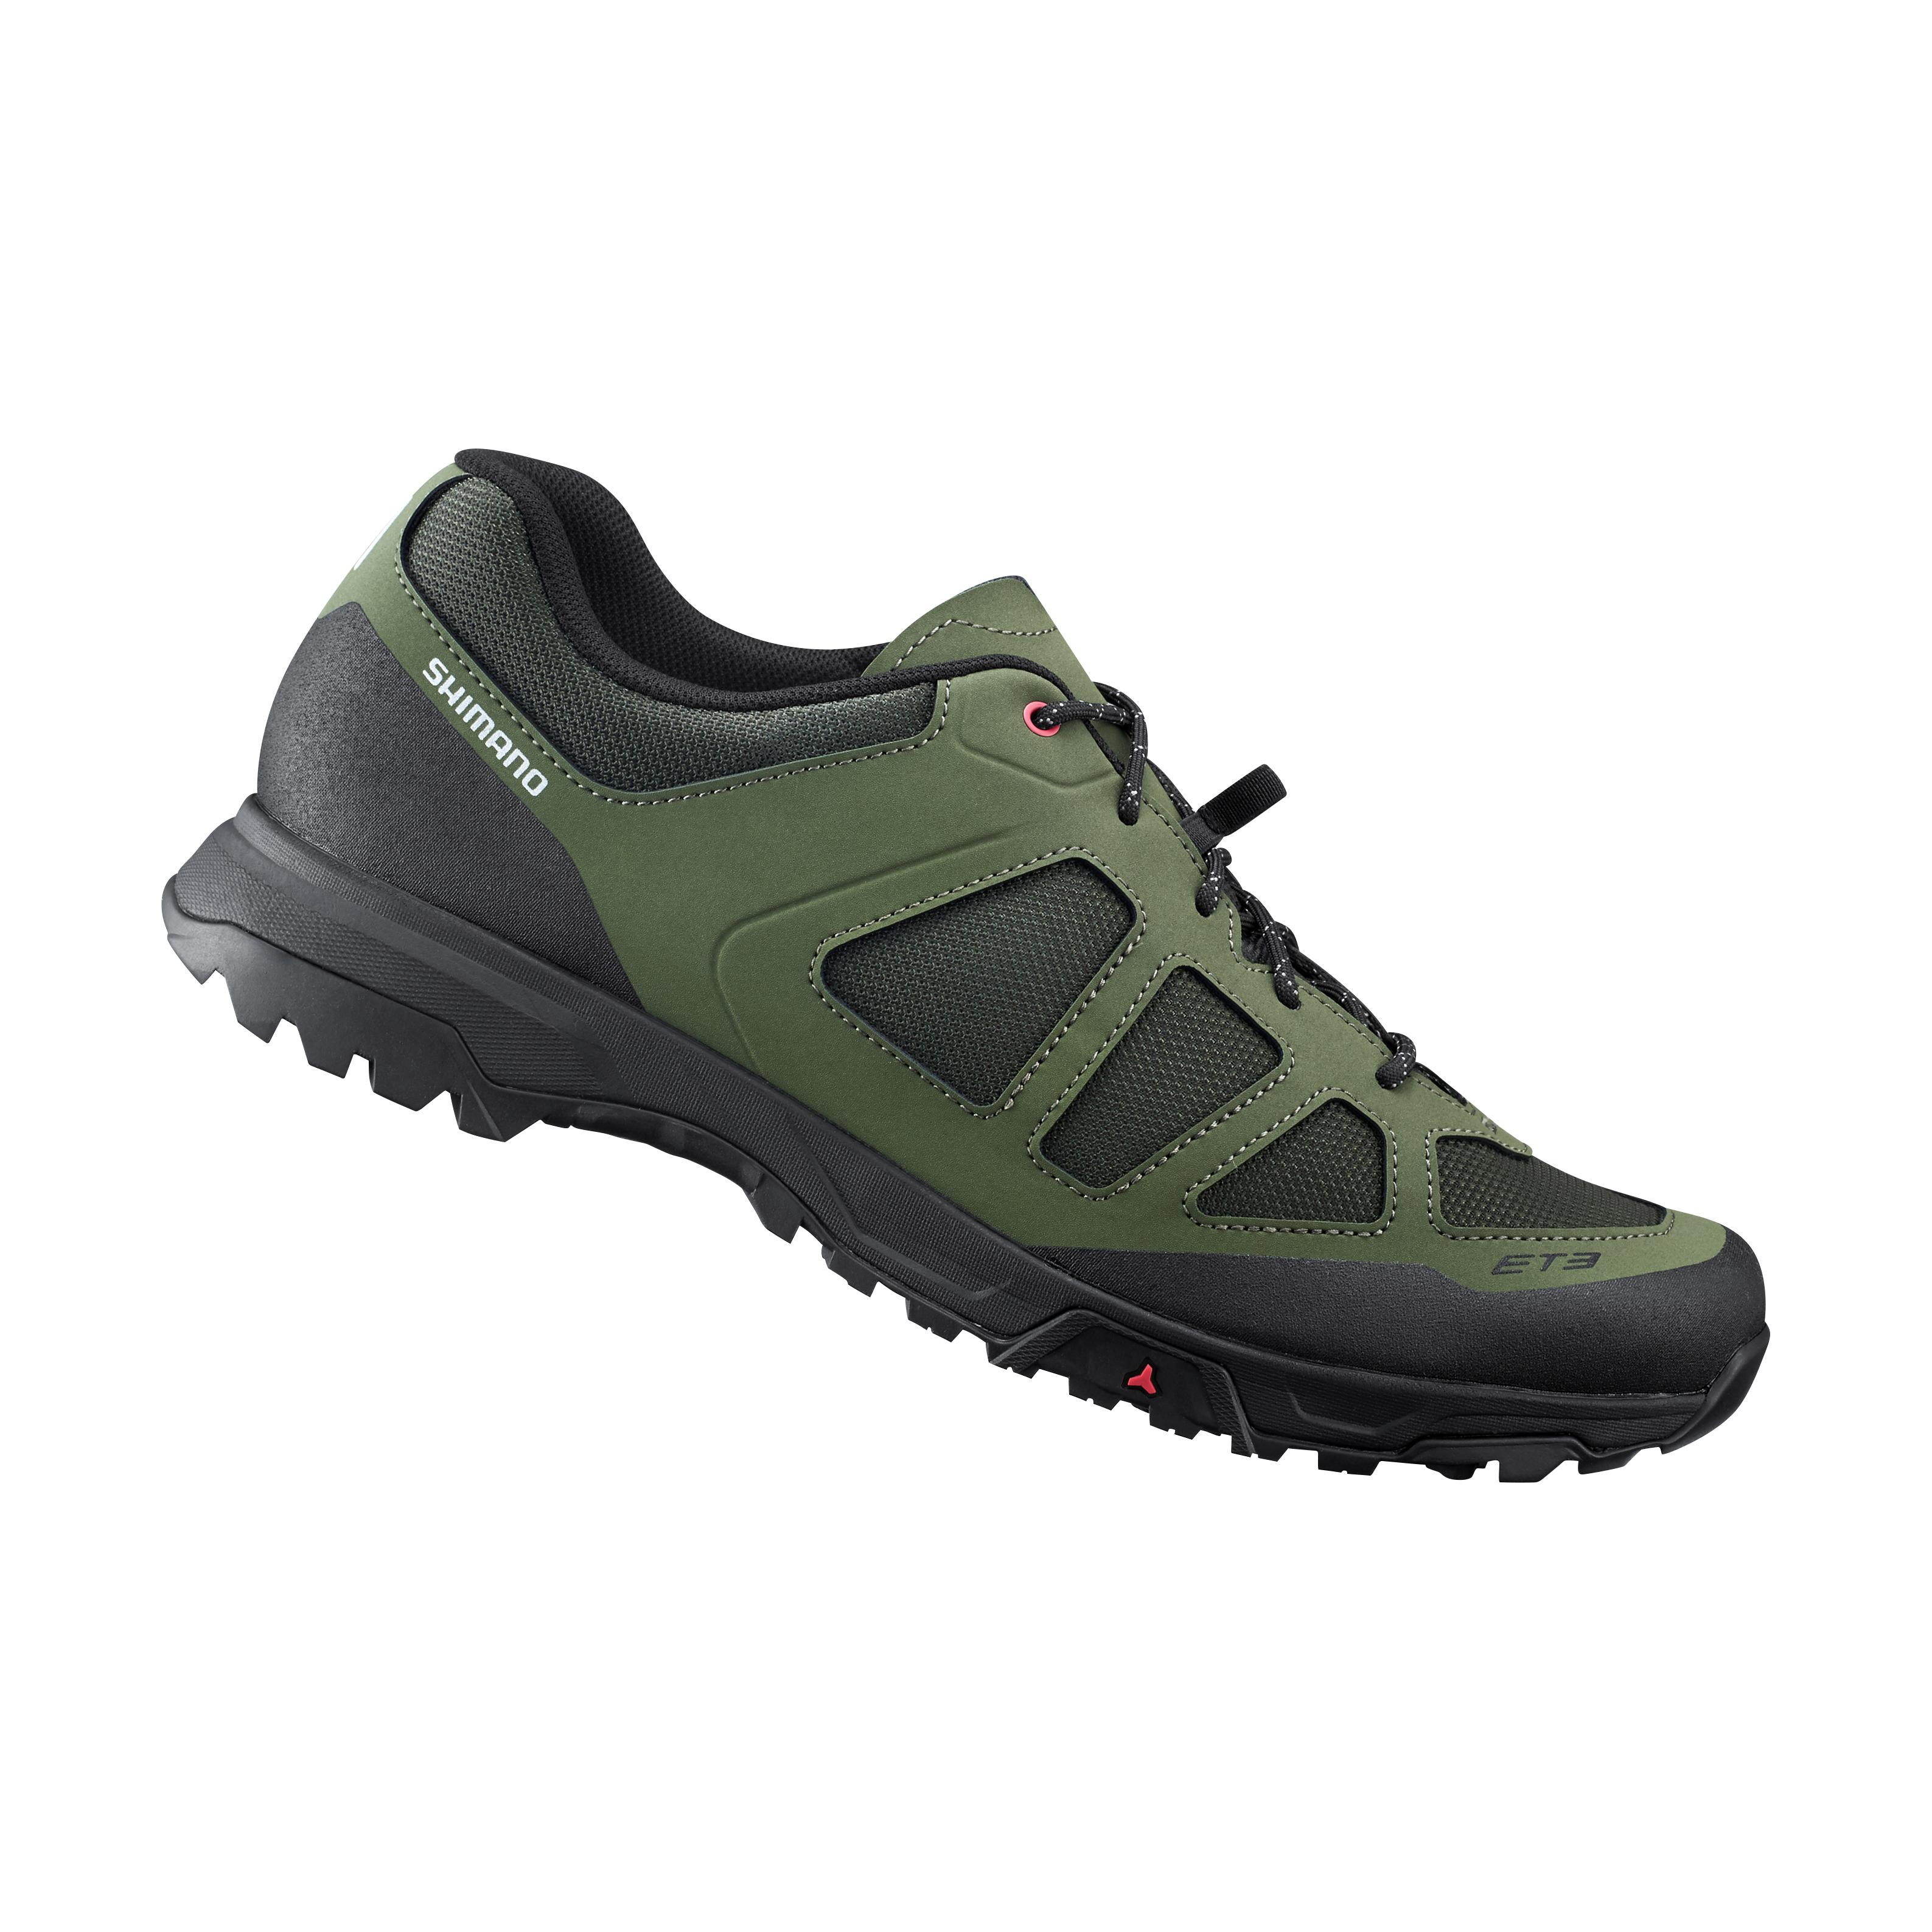 SHIMANO turistická obuv SH-ET300, khaki, 42